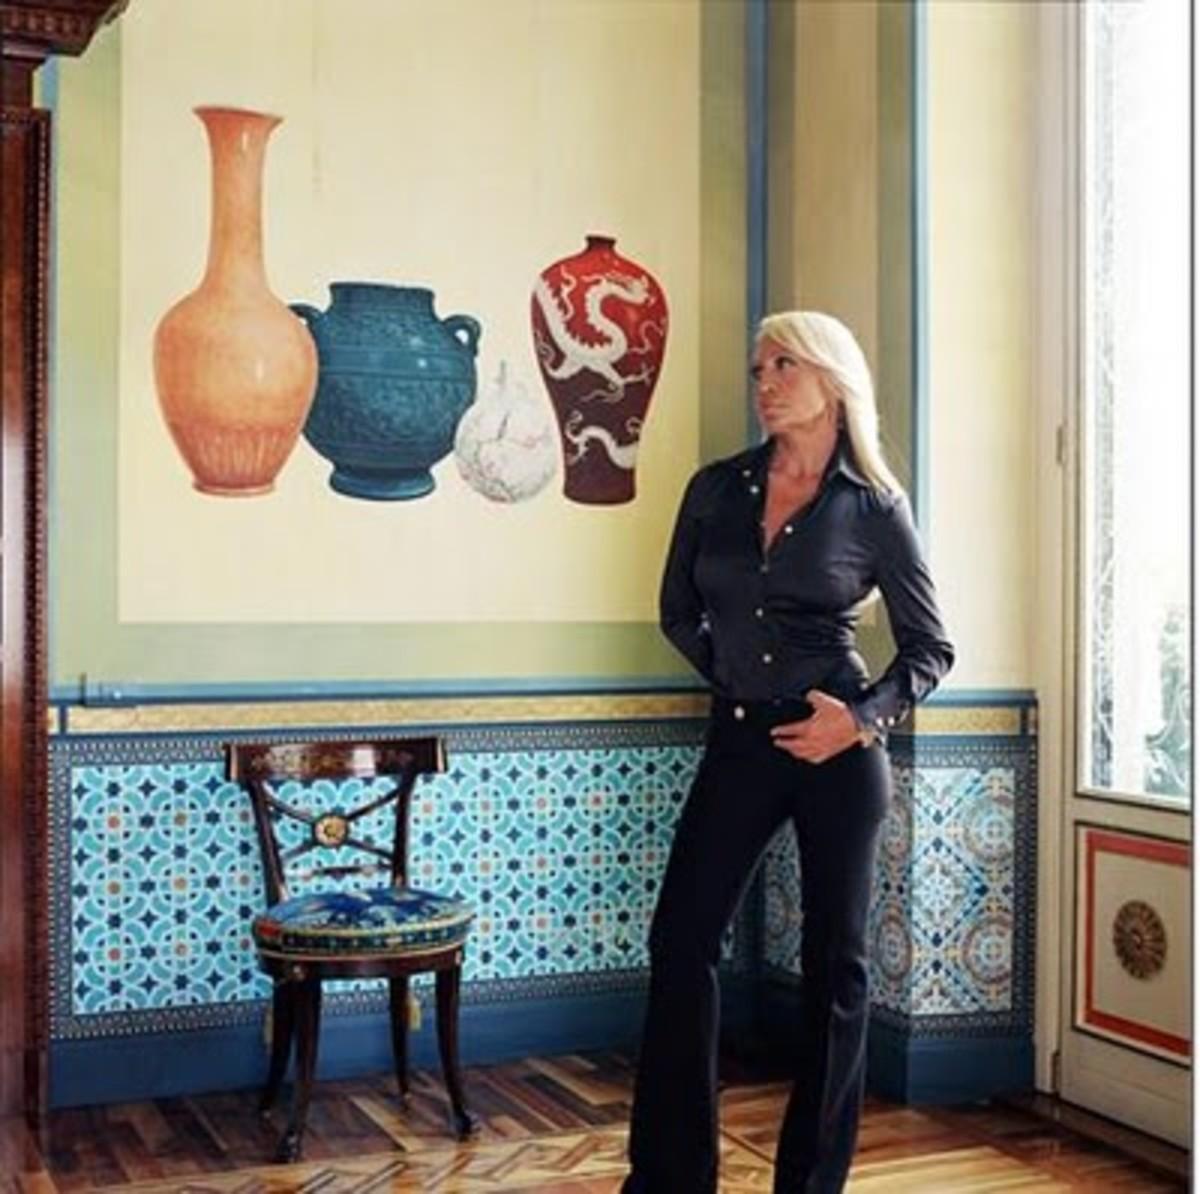 """I'm not a minimalist"" - Donatella Versace, striking a pose in Milan."